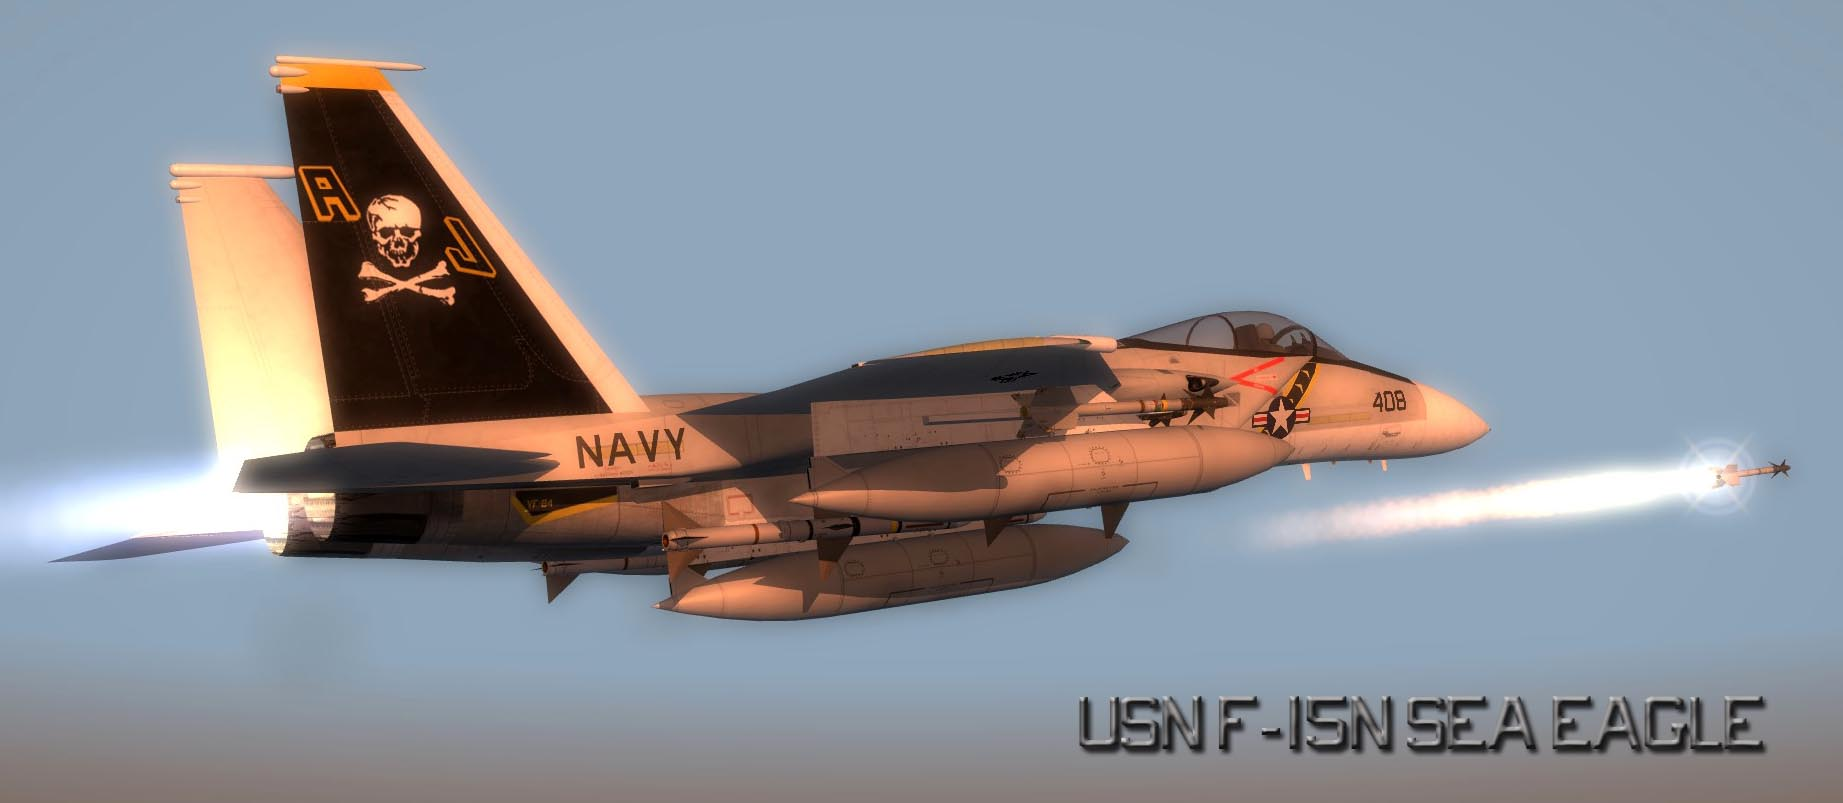 USN F 15N 4